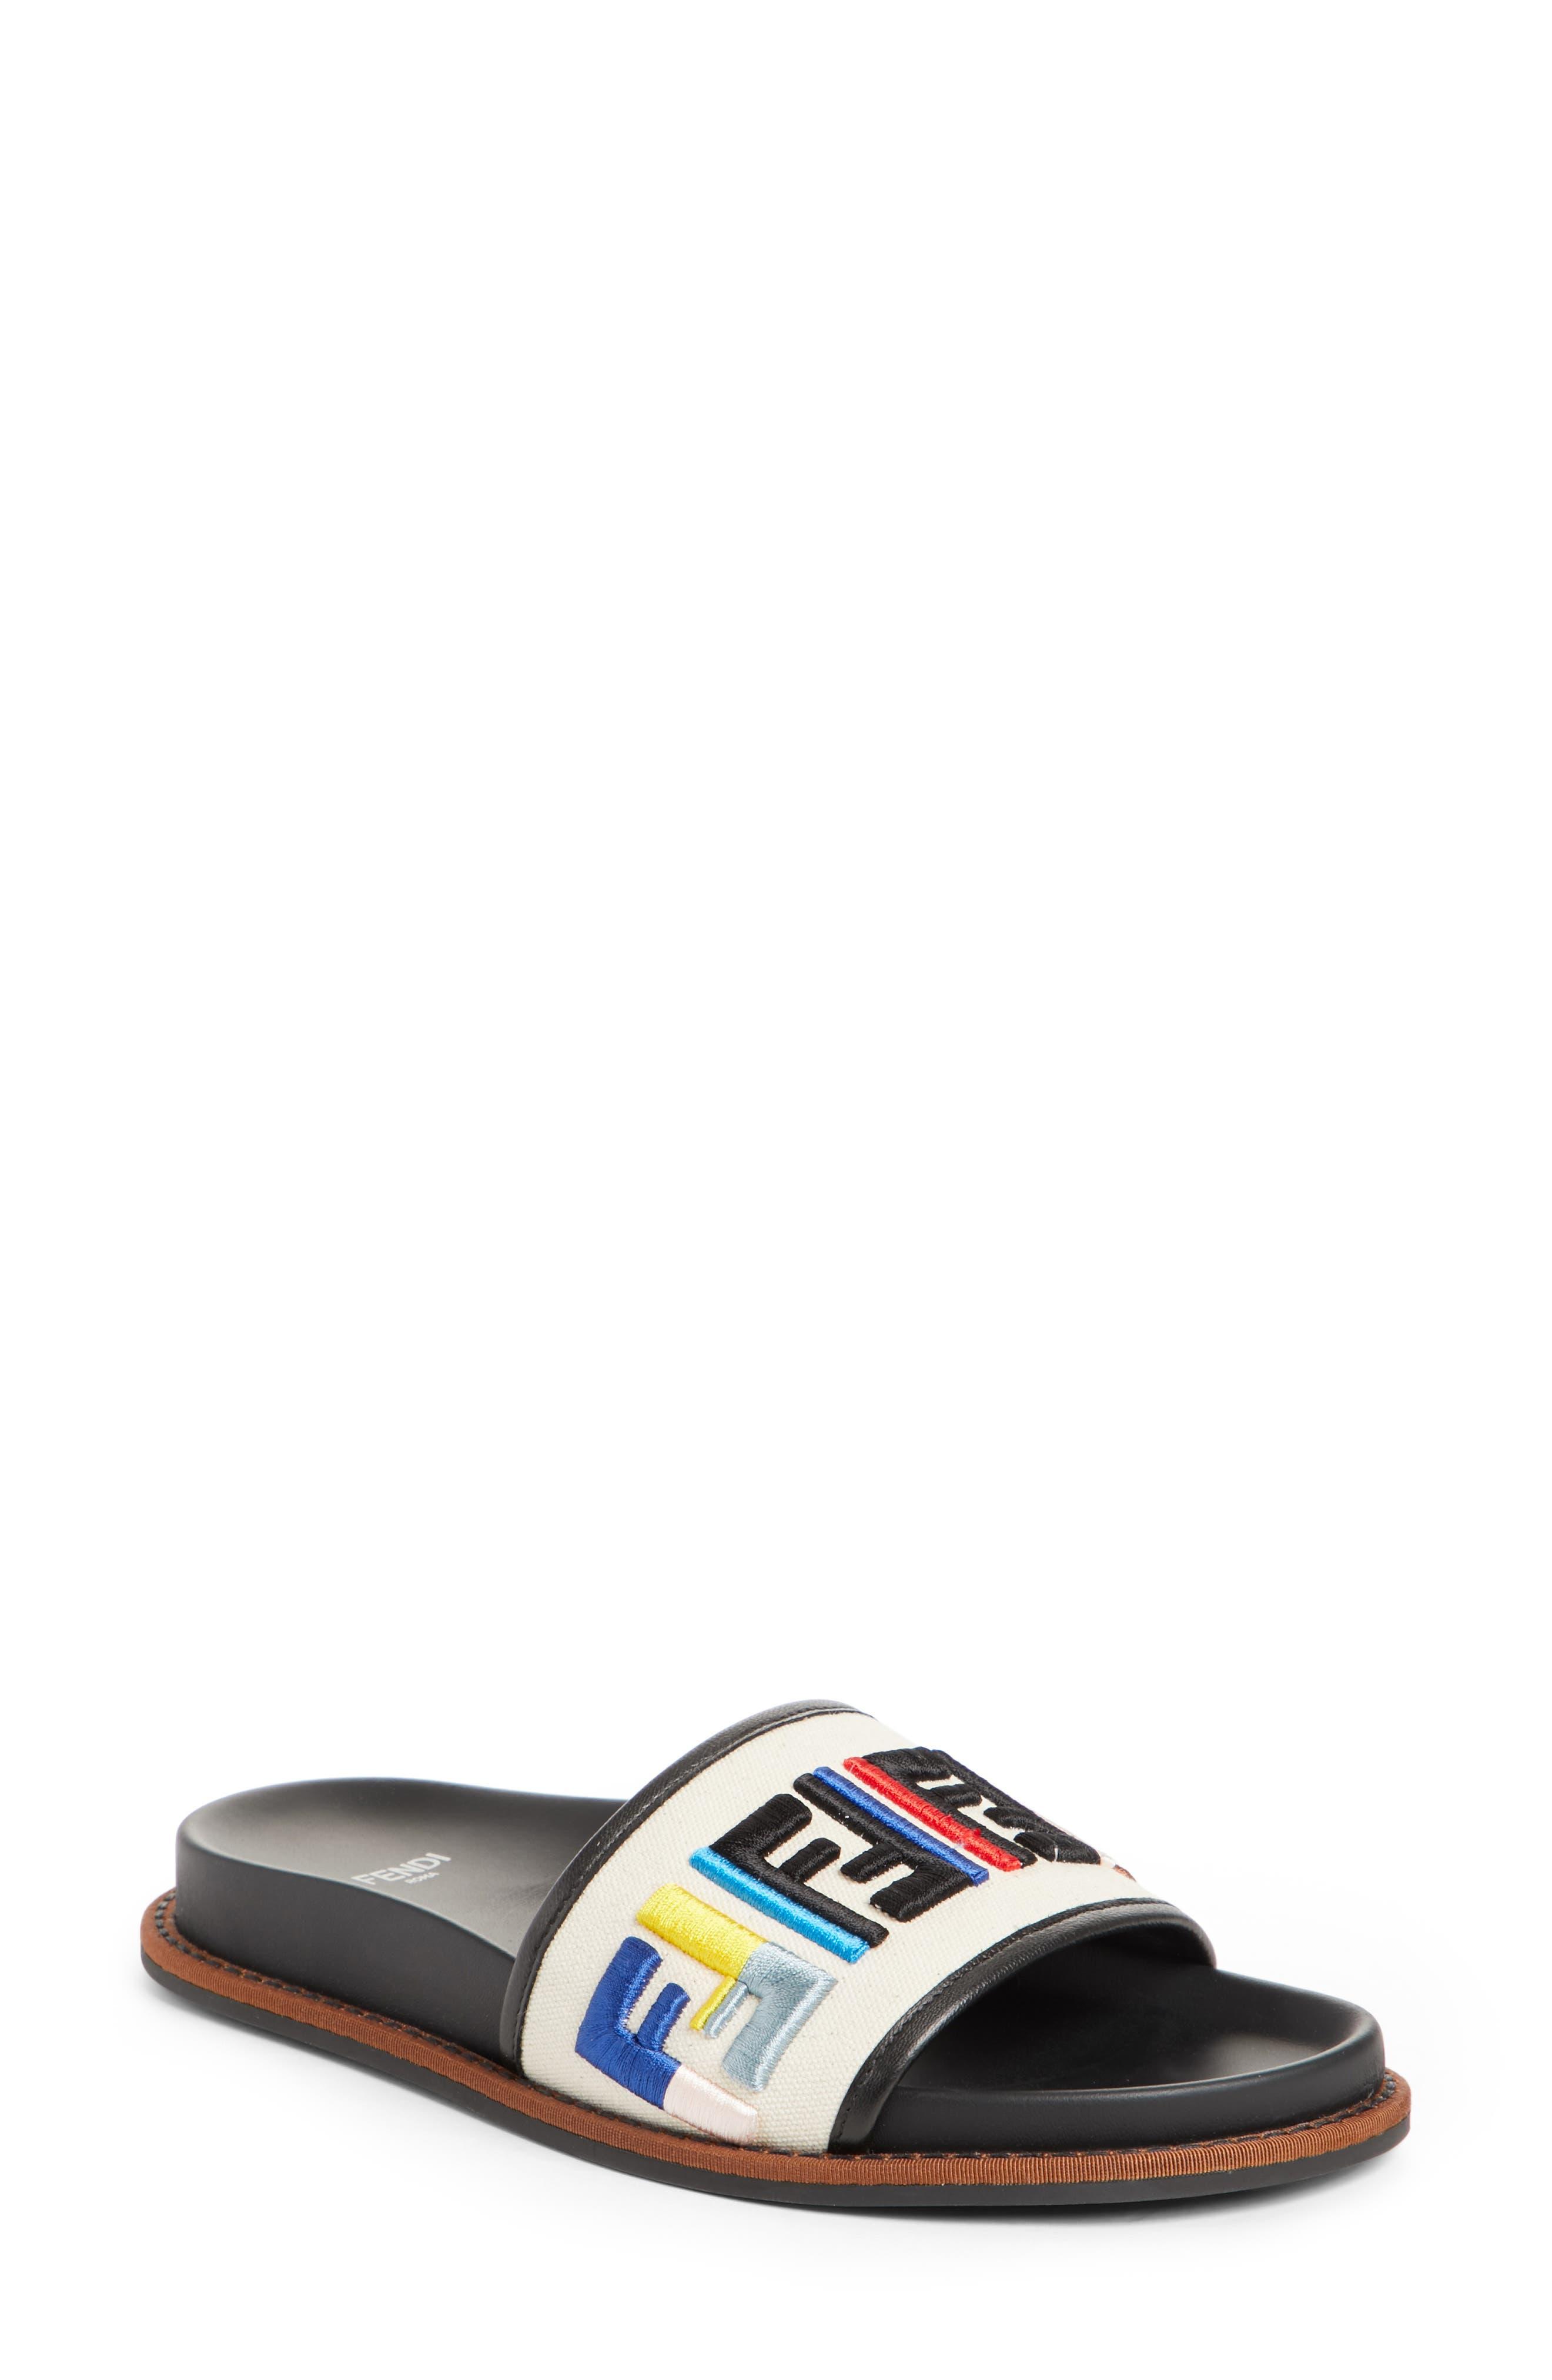 Alternate Image 1 Selected - Fendi Fun Fendi Logo Slide Sandal (Women)